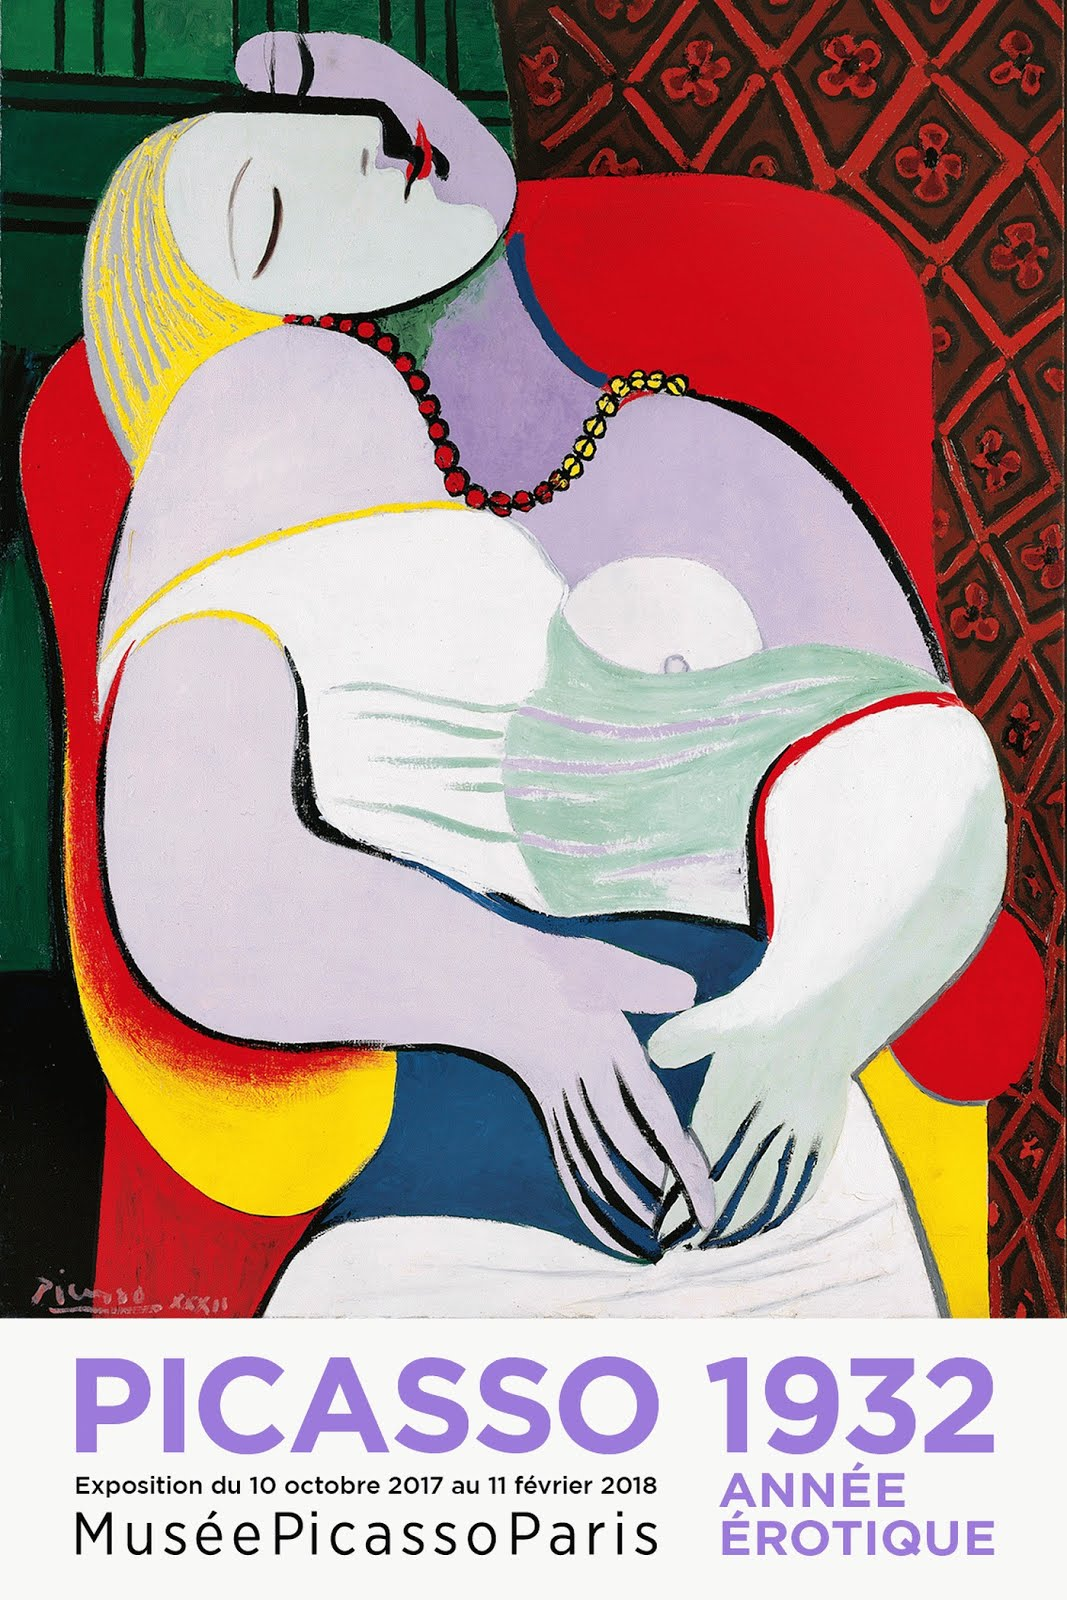 Picasso, 1932